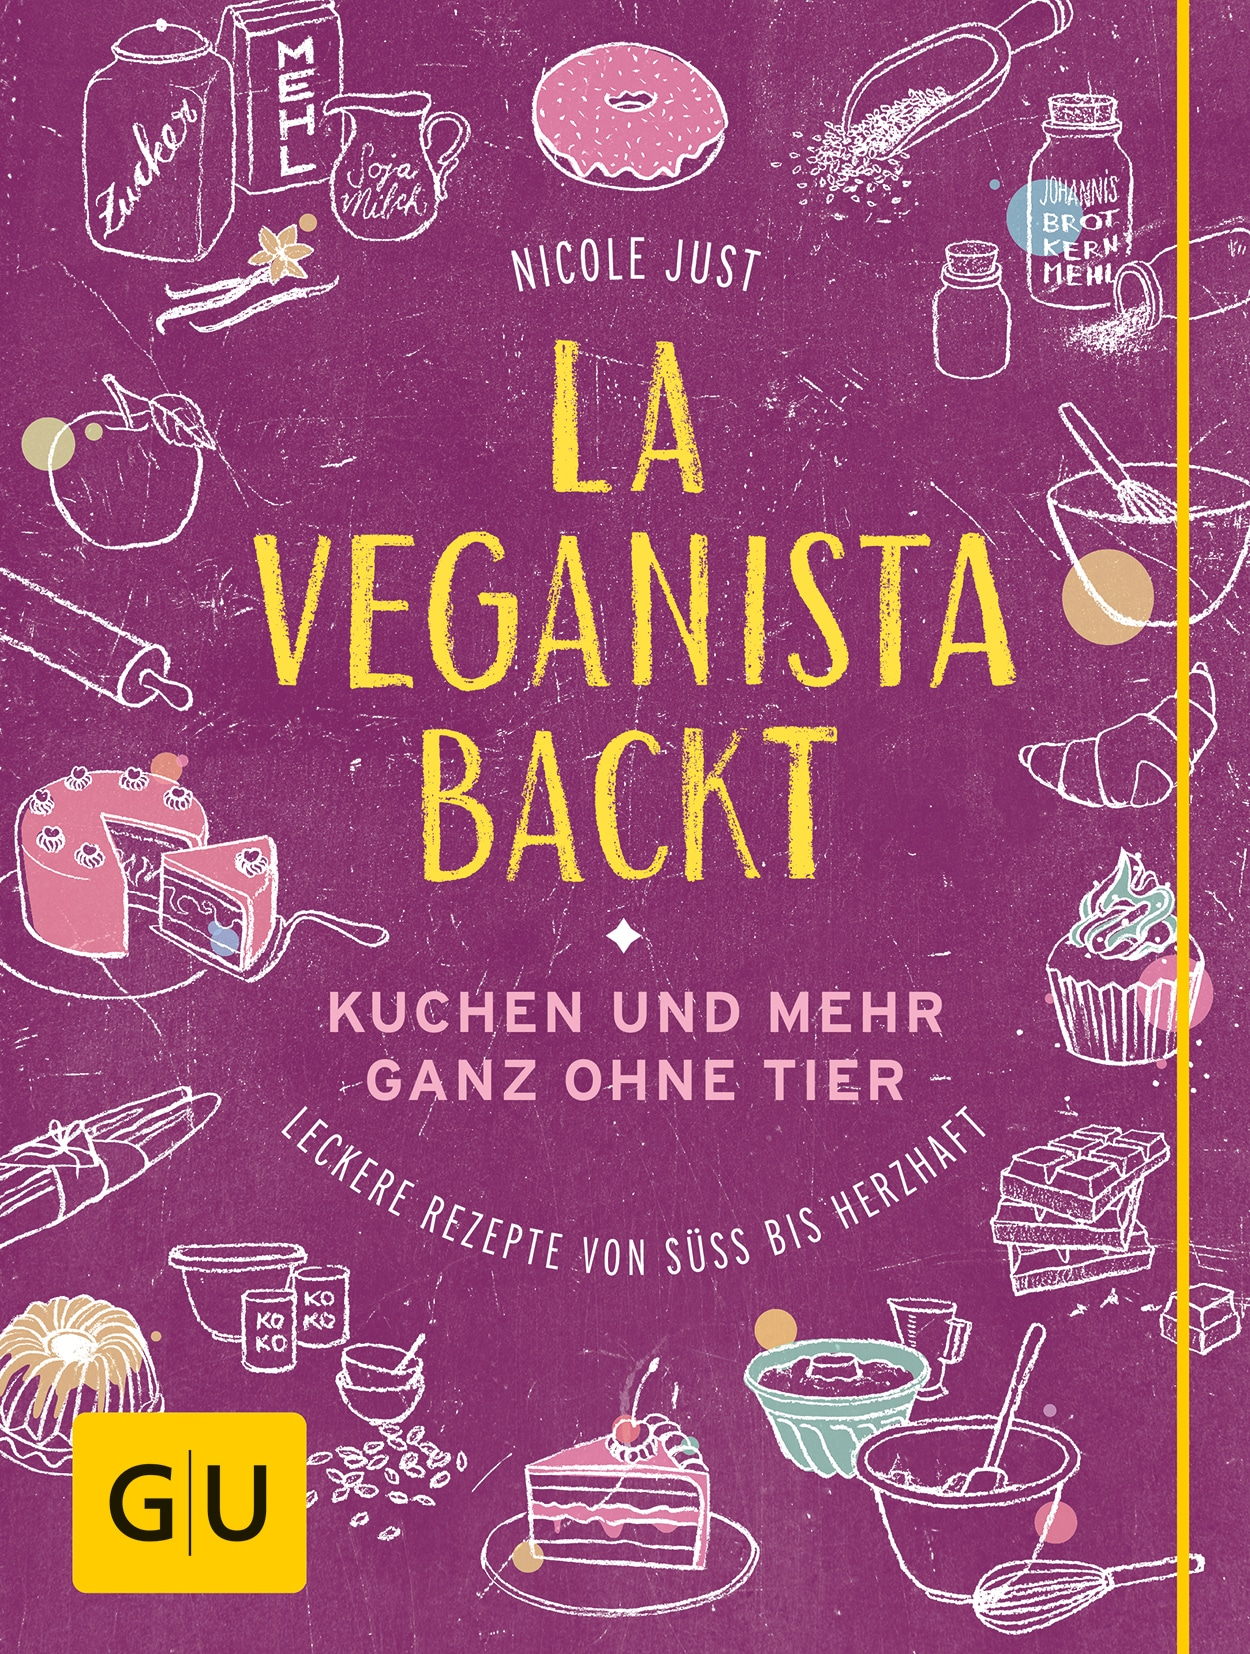 La Veganista backt - Buch (Hardcover)